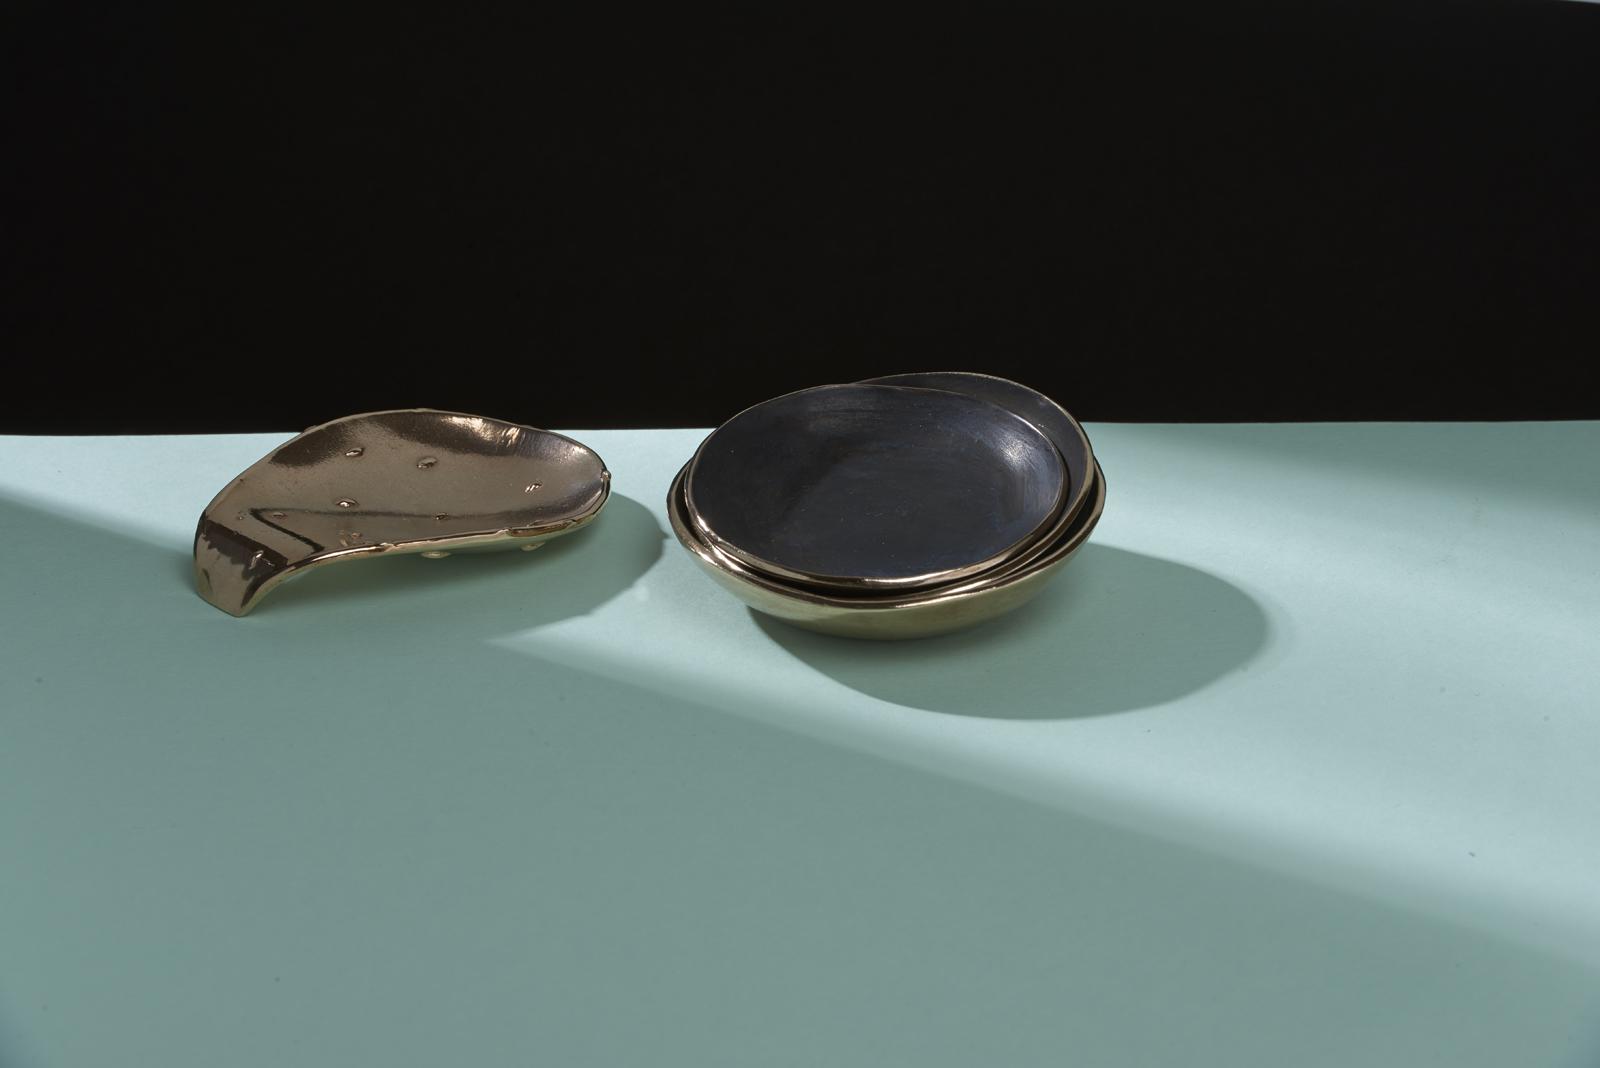 Cactus + Nesting Bowls.jpg